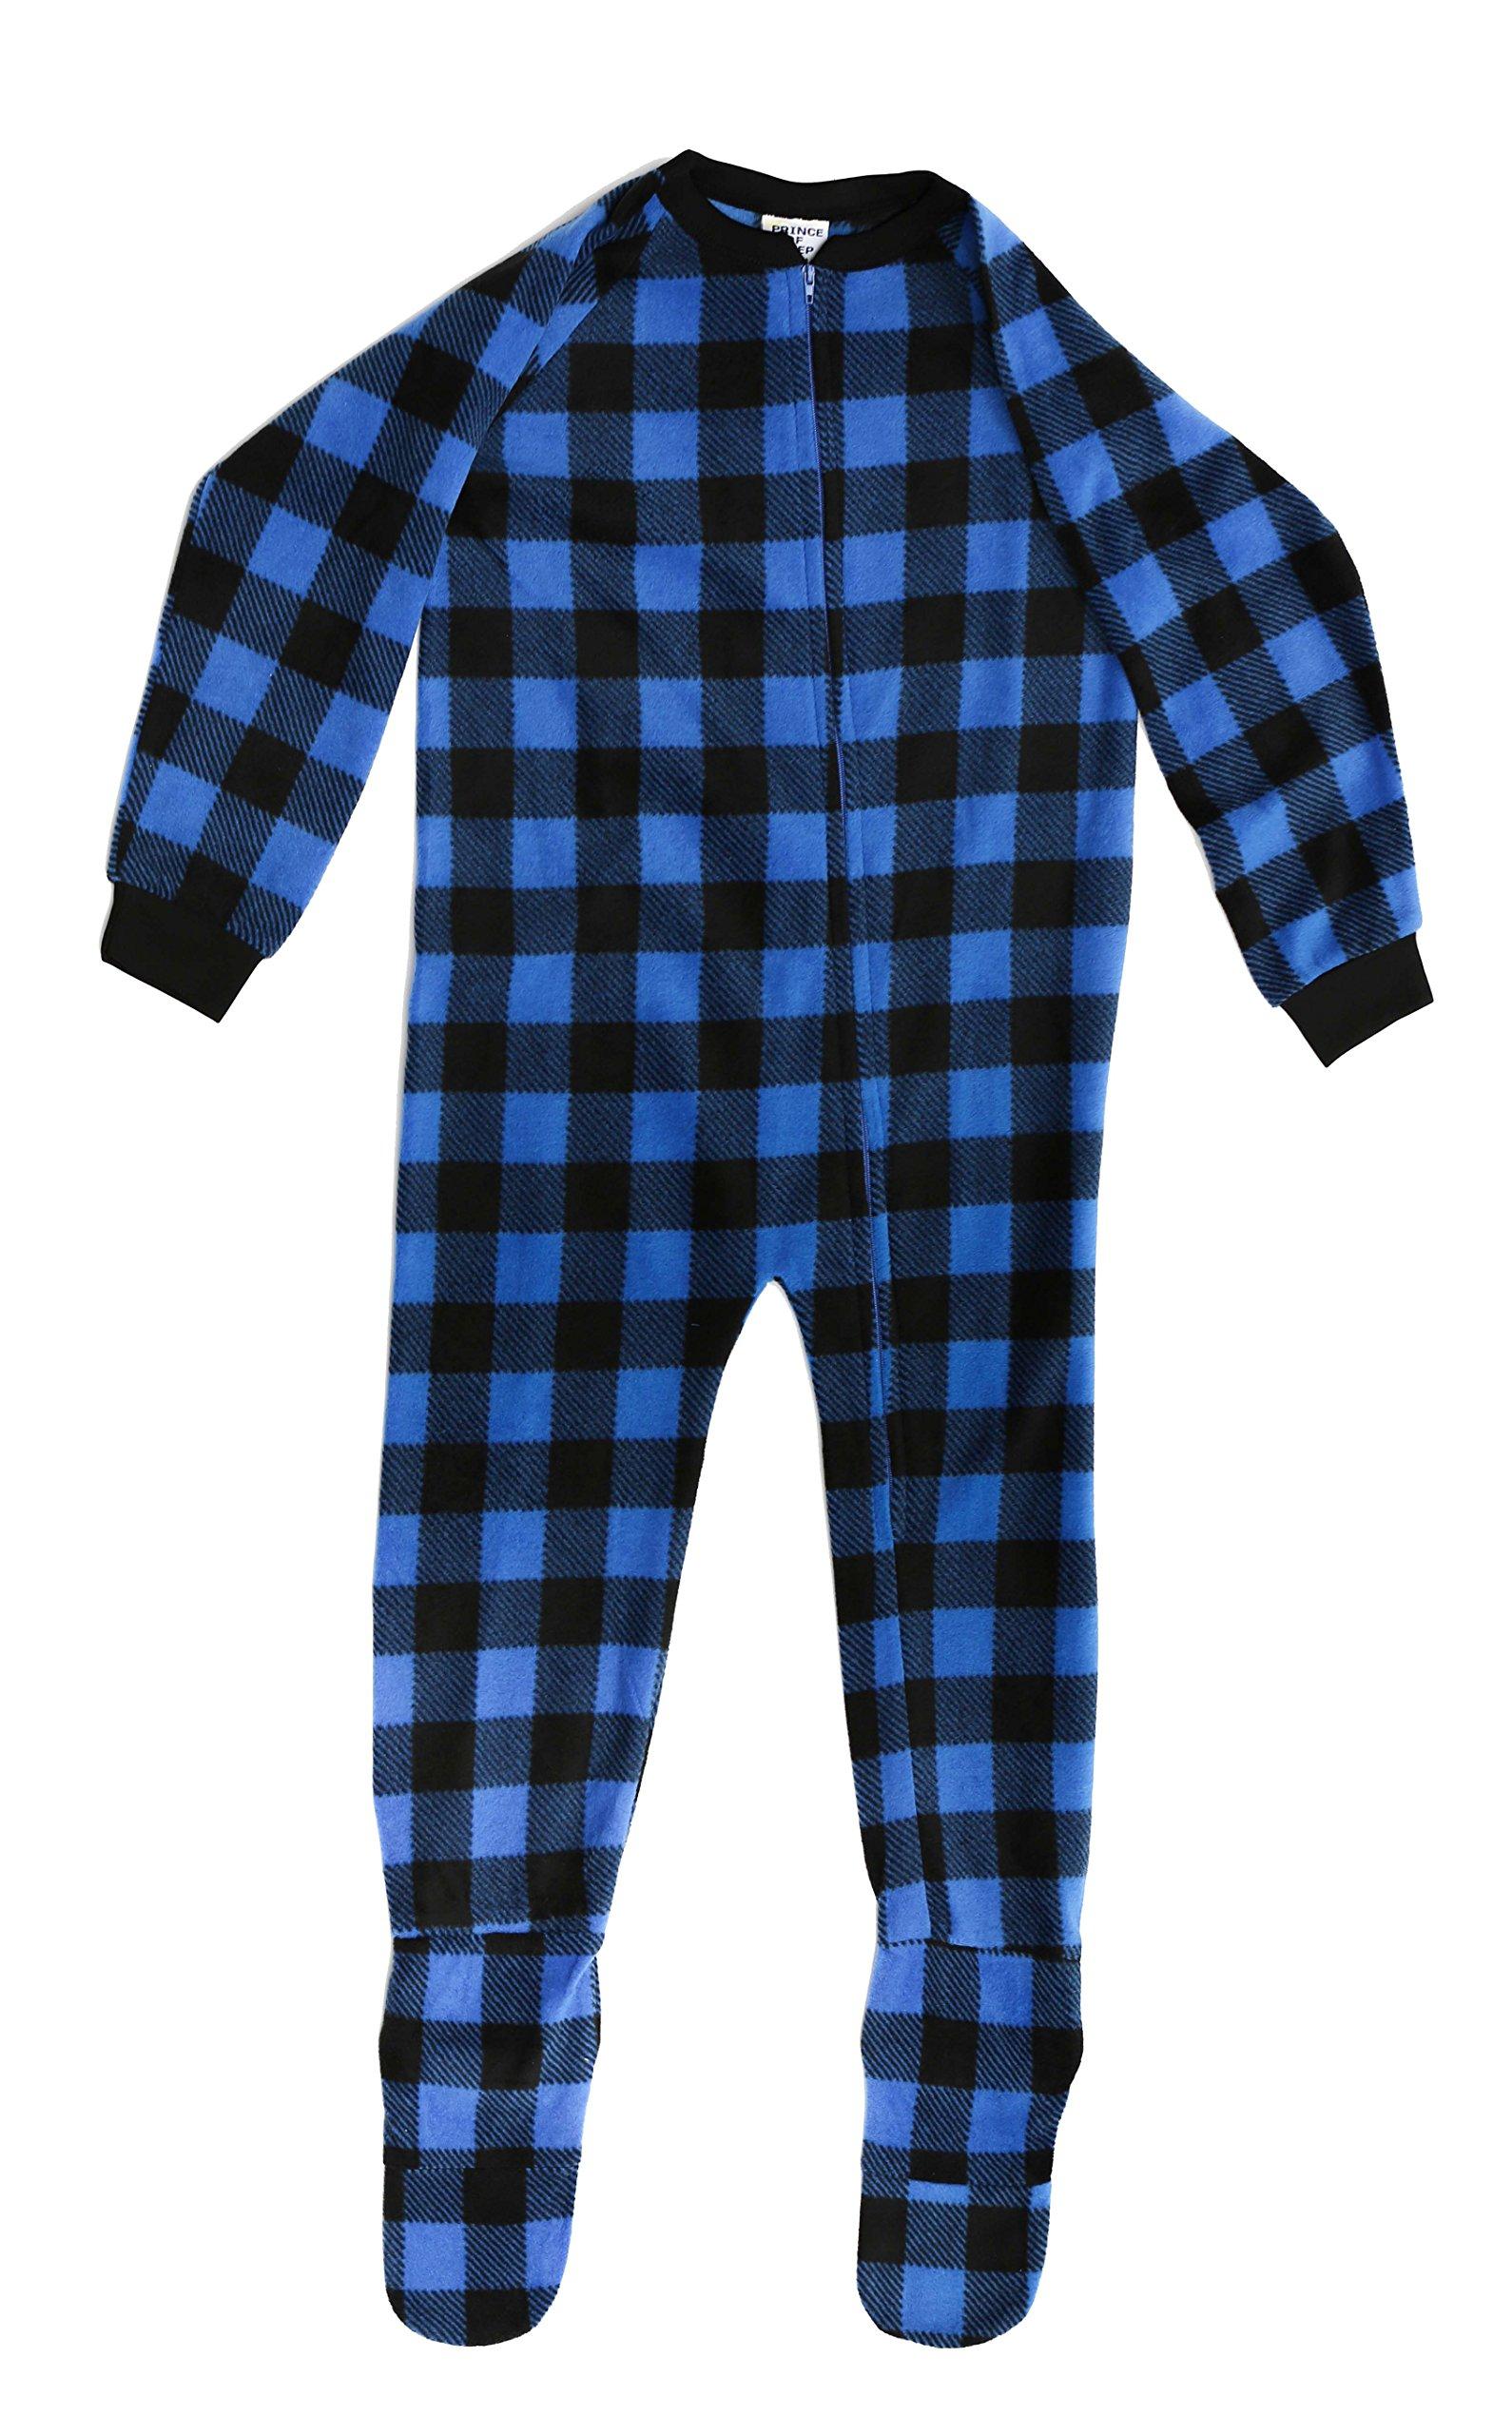 95598-7B-10/12 Prince of Sleep Footed Pajamas / Micro Fleece Blanket Sleepers